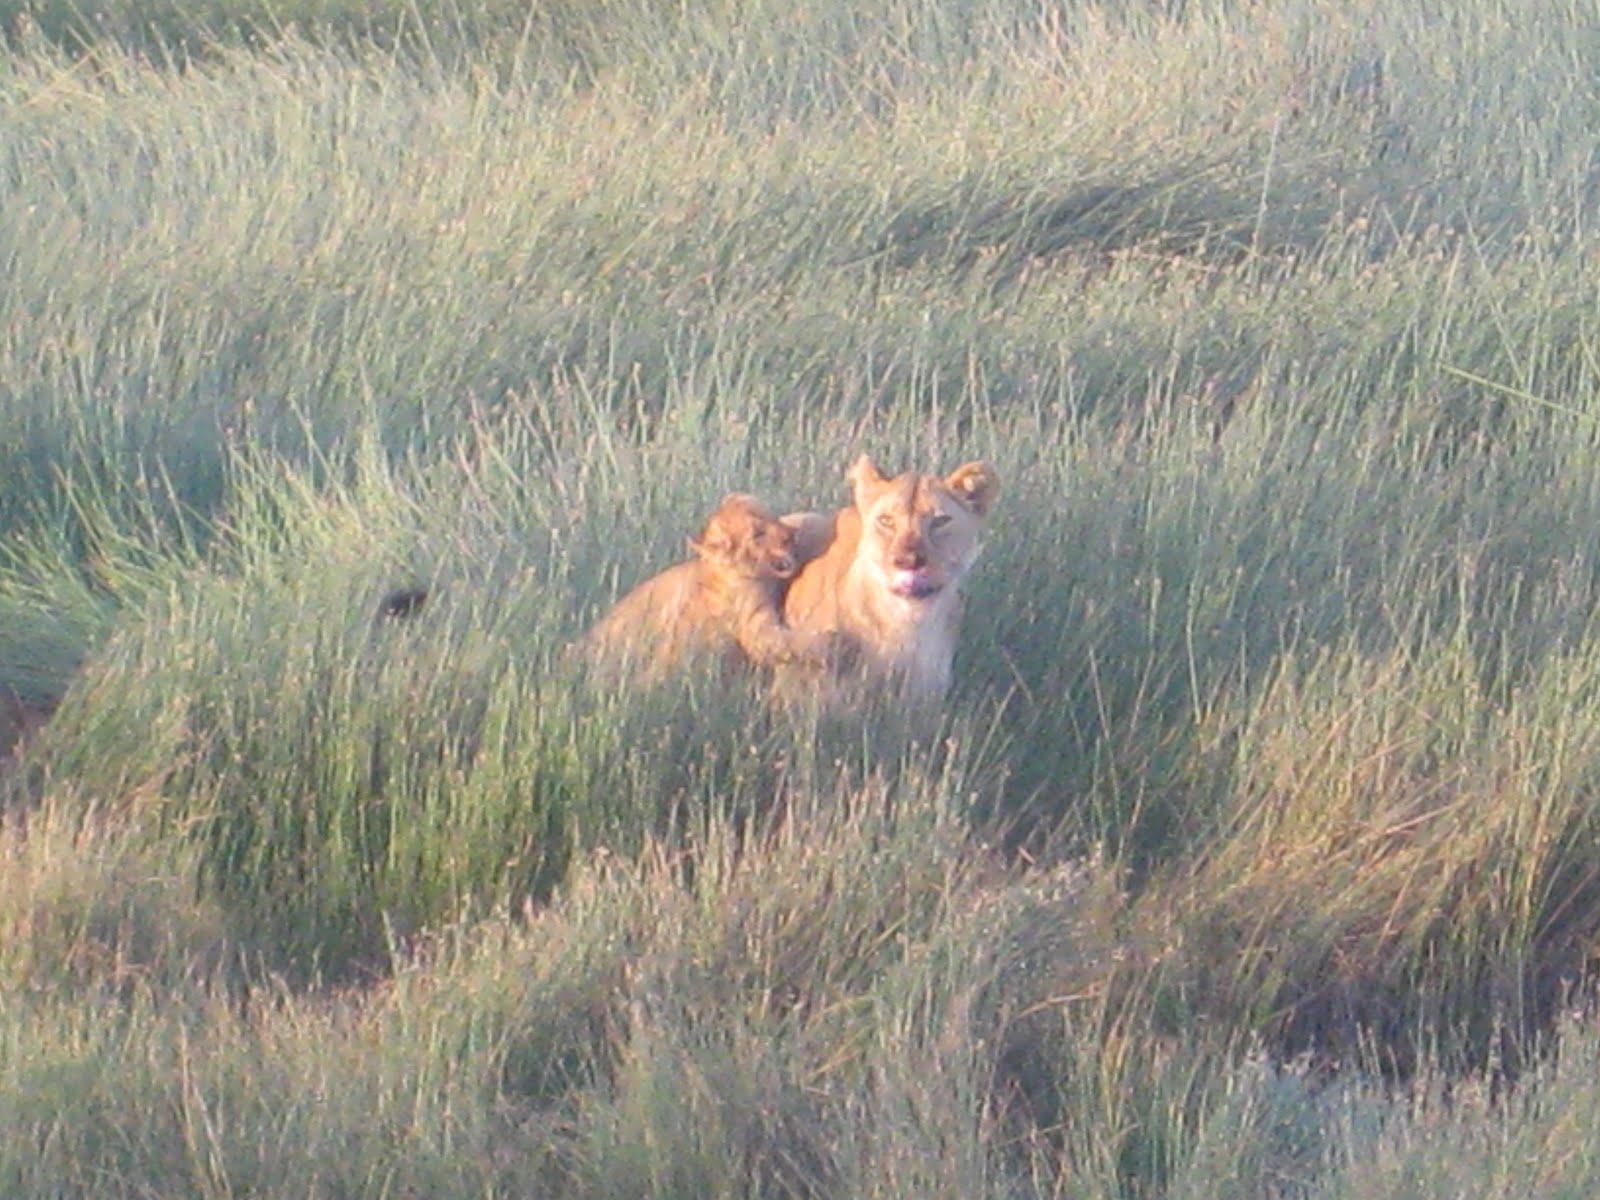 wp-content/uploads/itineraries/Safari/safari-serengeti-migration.jpg